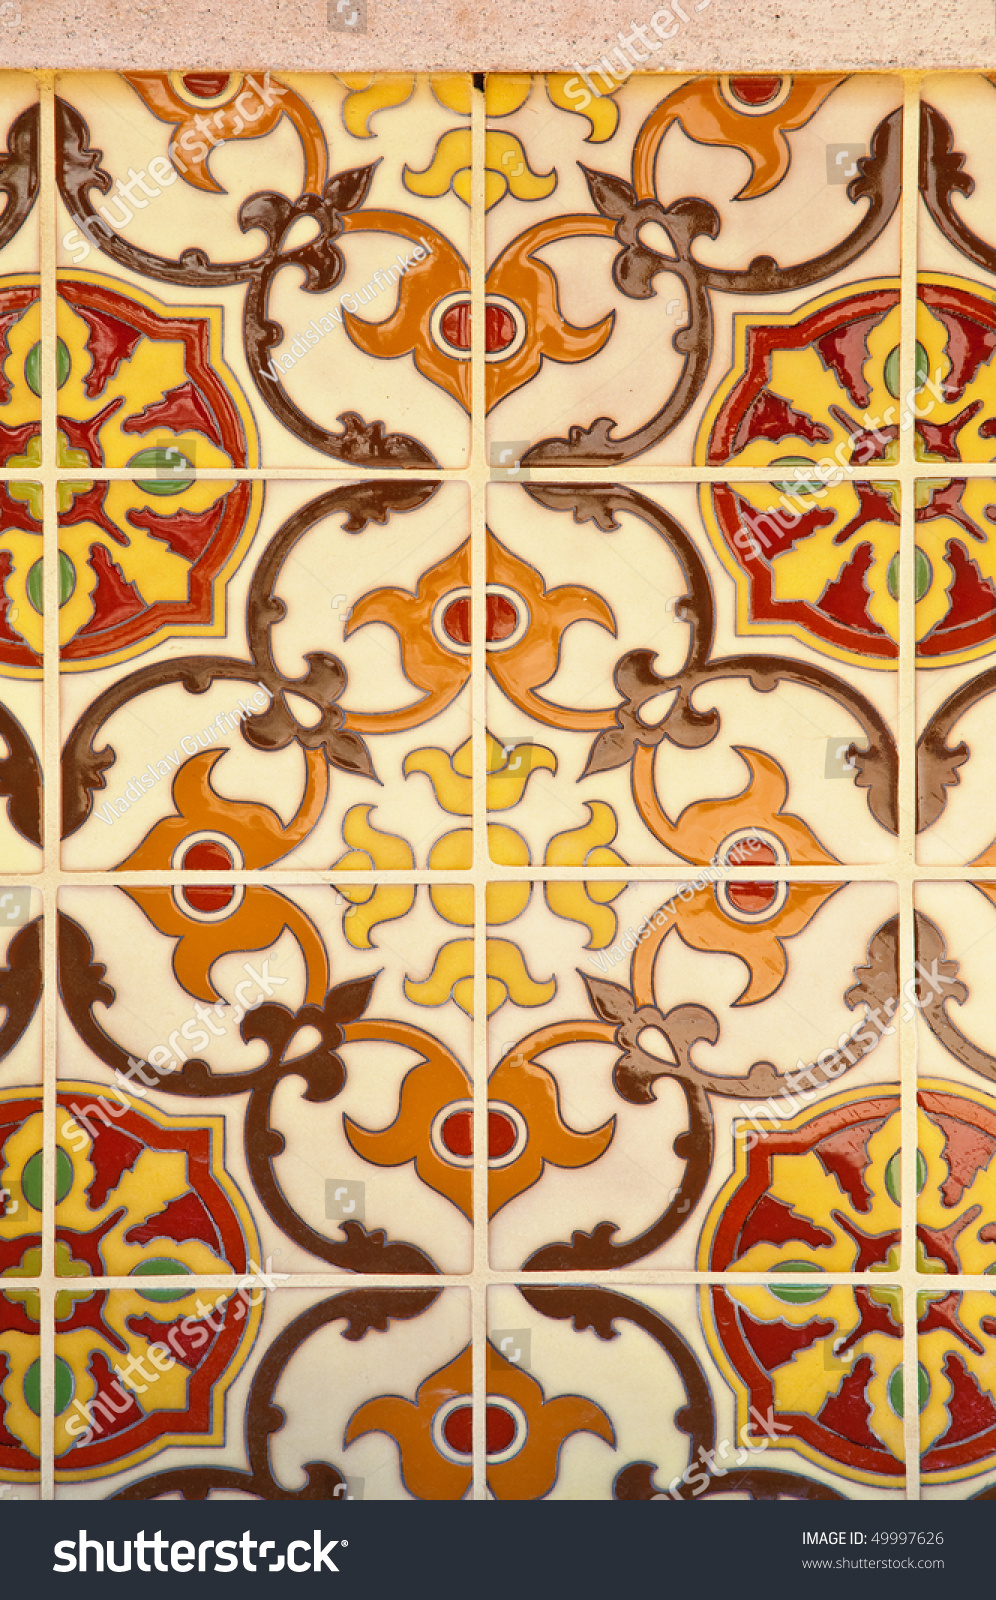 Colorful Vintage Spanish Style Ceramic Tiles Stock Photo Edit Now